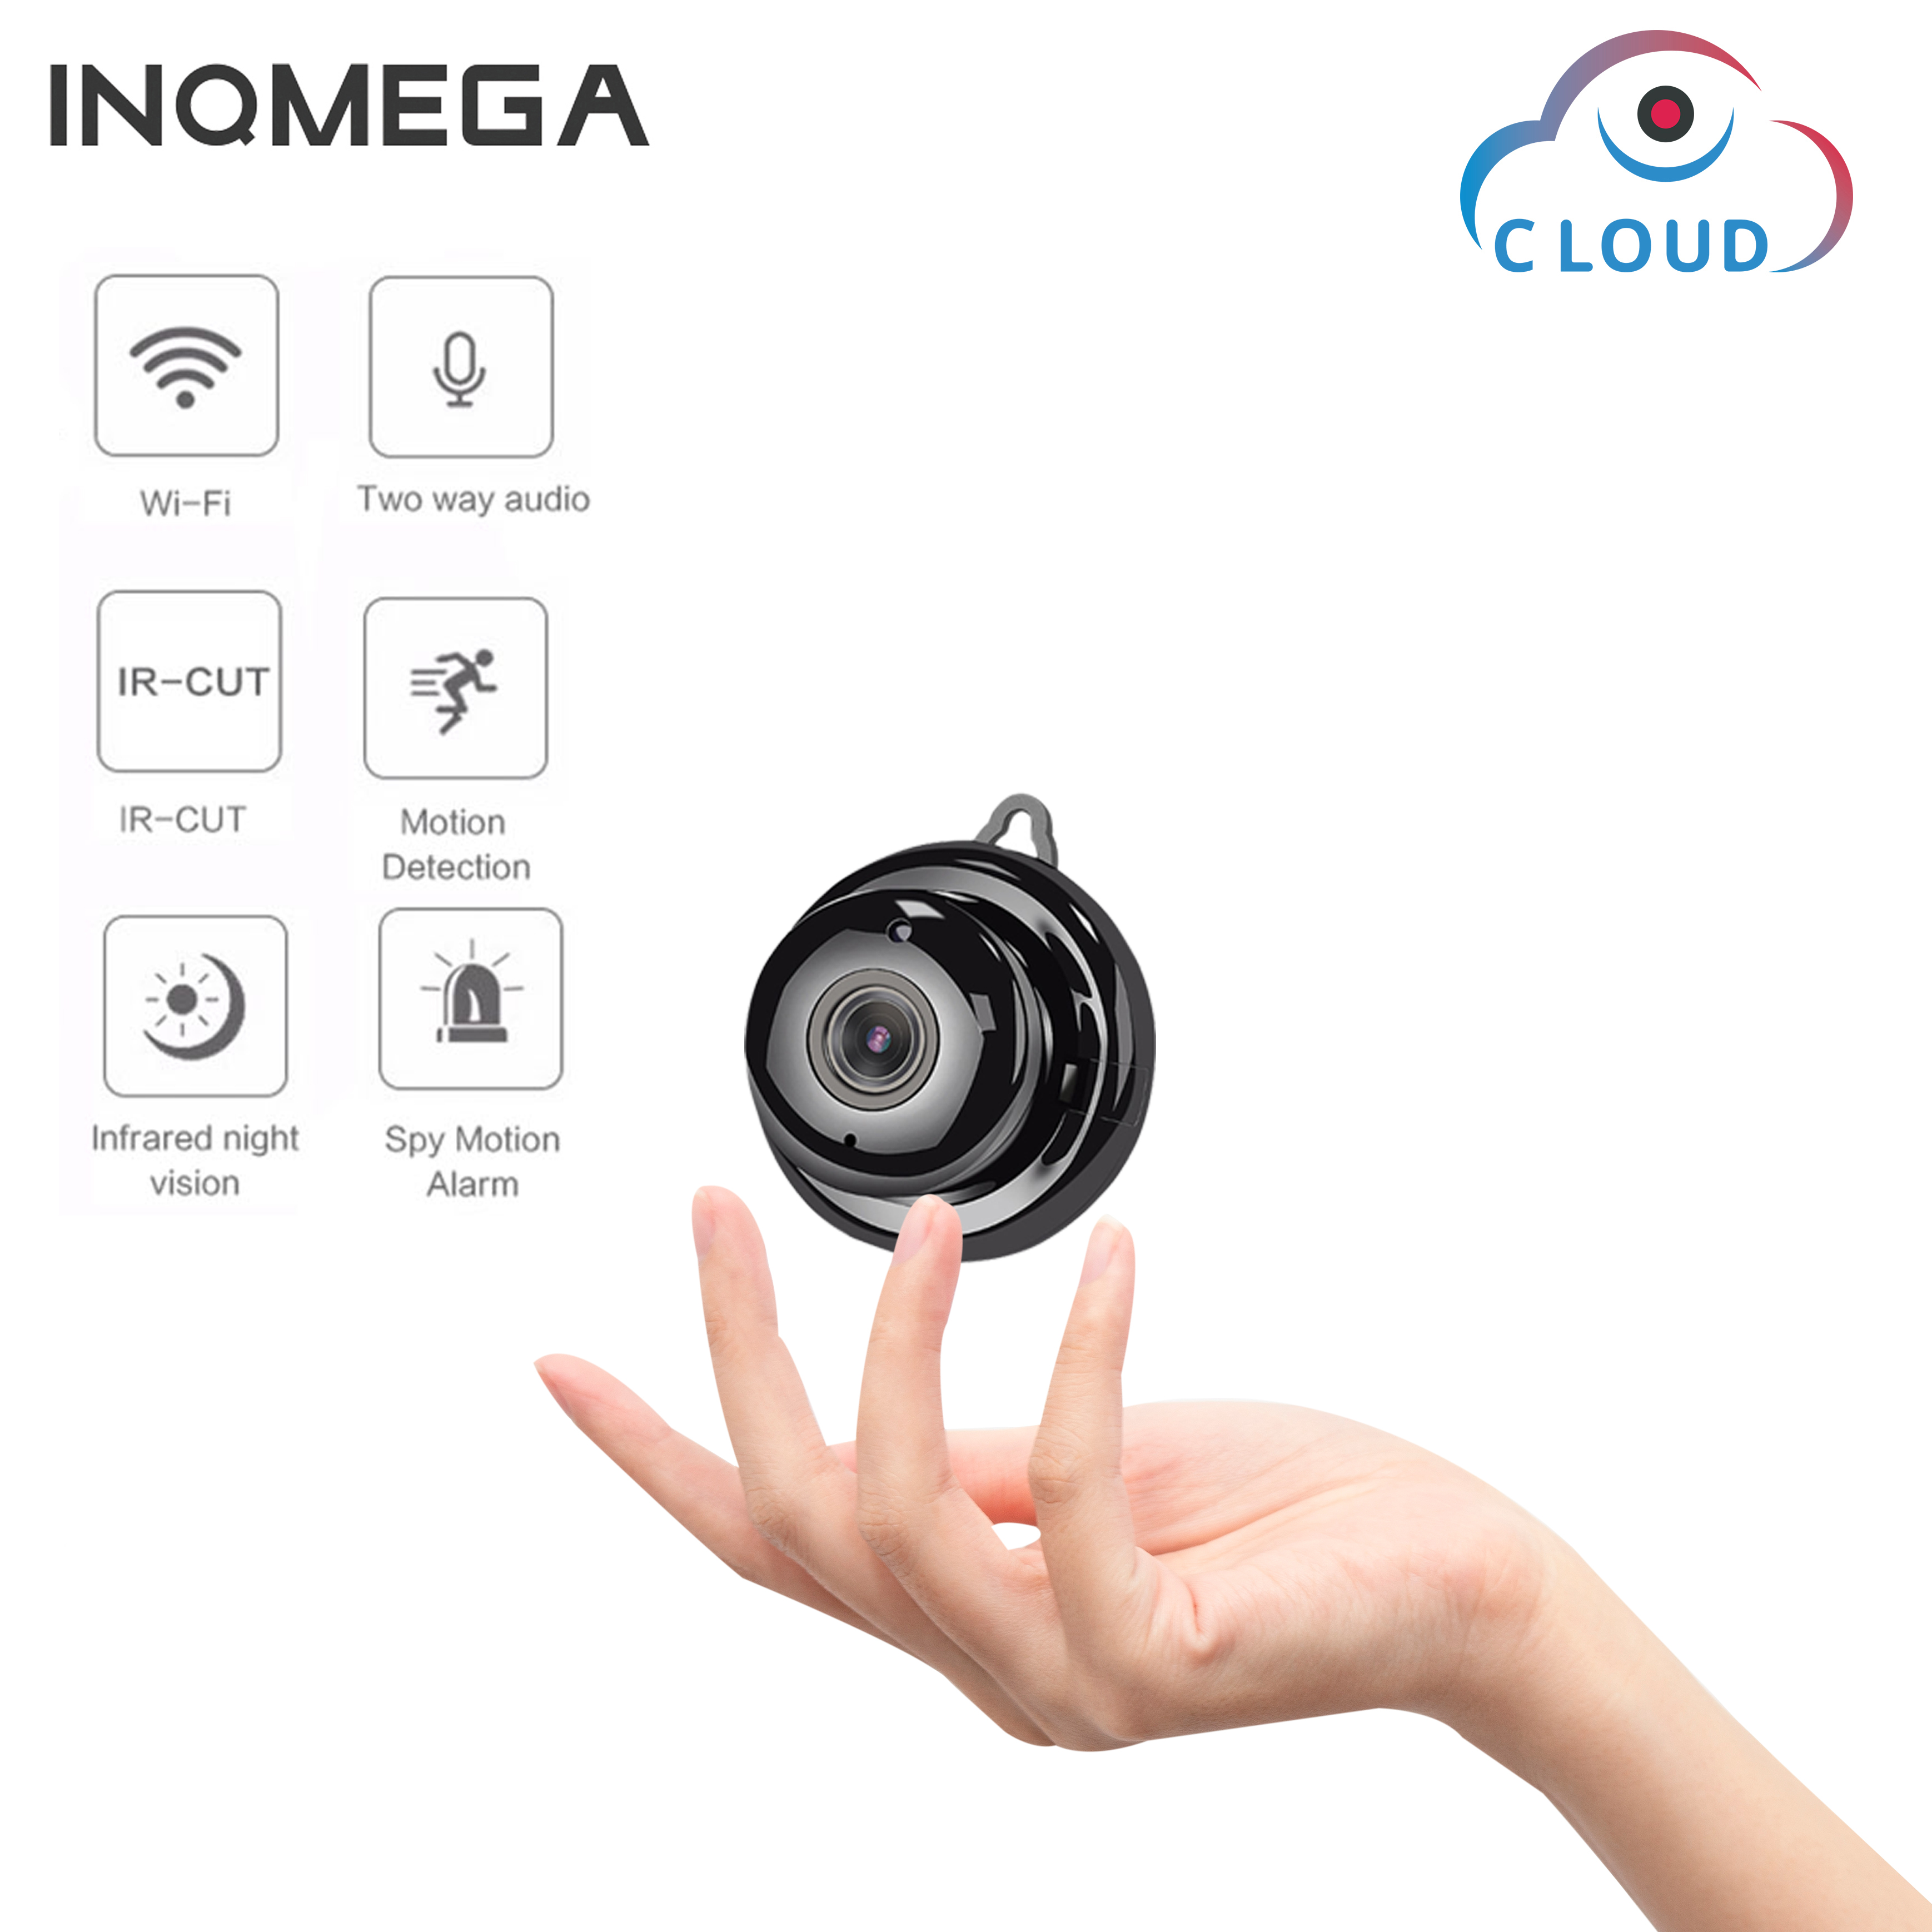 INQMEGA 960P Wireless  Mini WiFi Camera Home Sec Surveillance IR Night Vision Motion Detect Baby Monitorurity Camera IP CCTV